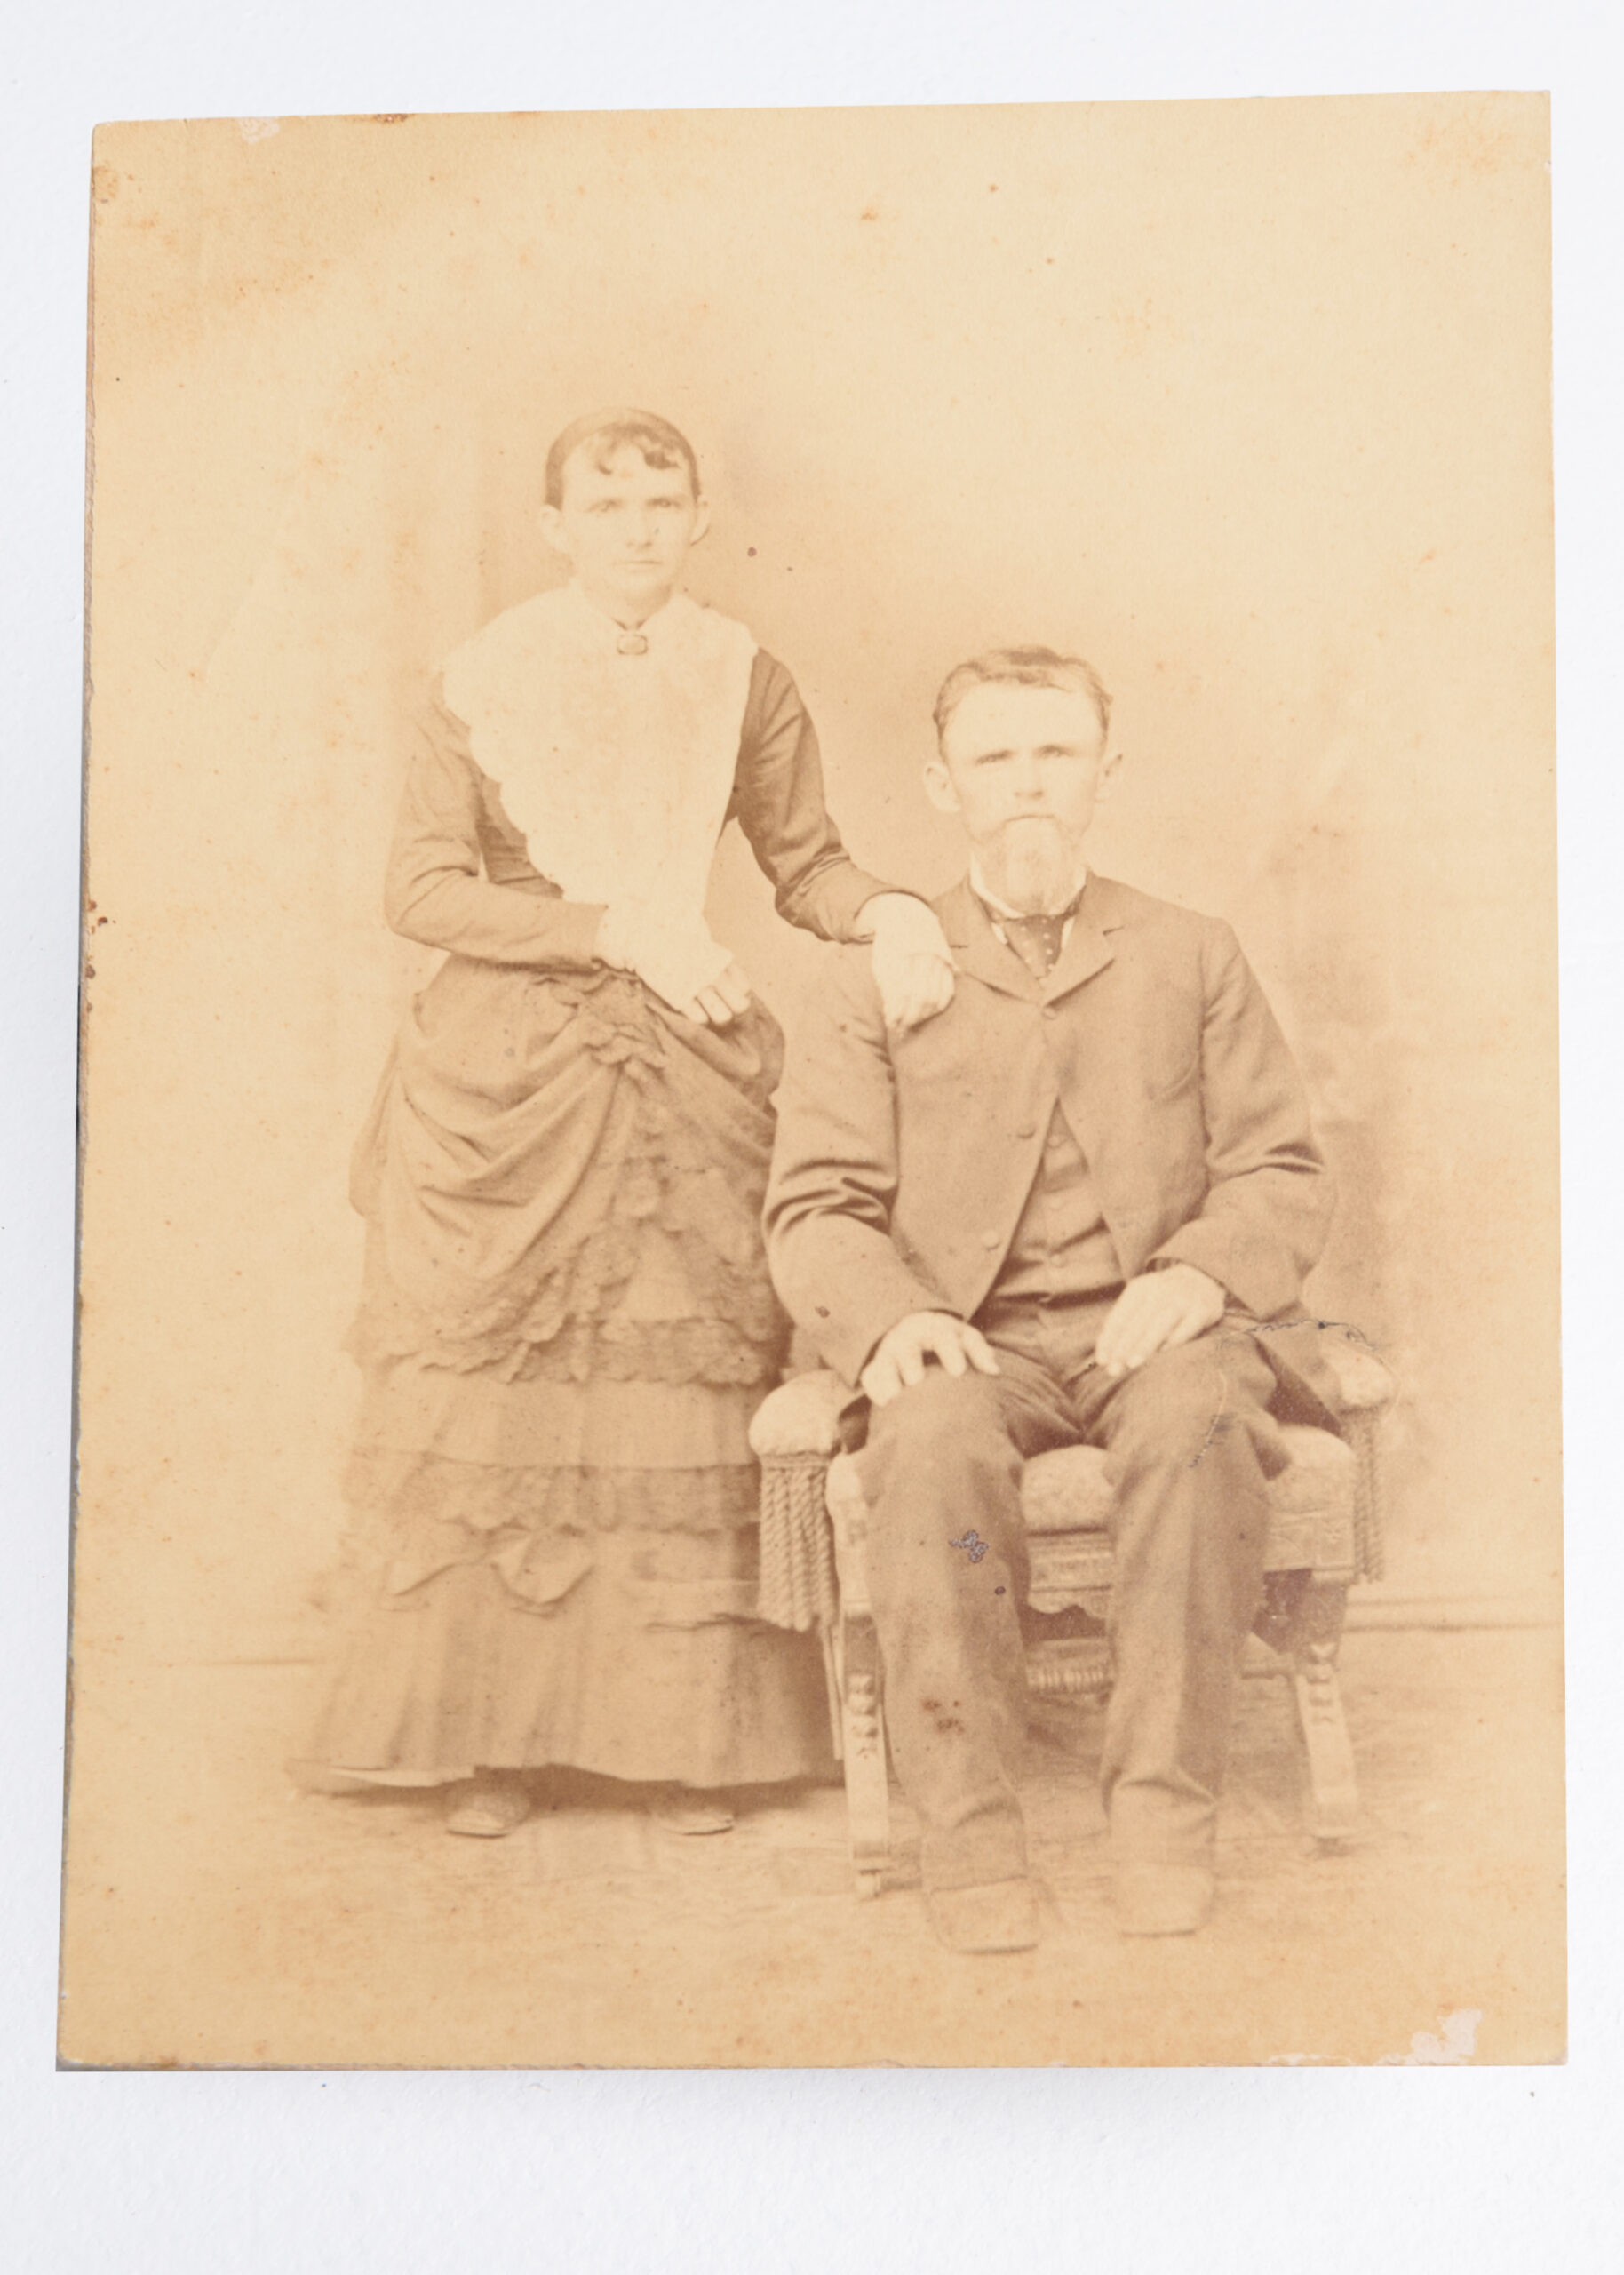 The Famous Toepperweins Gunslinger Kendall County Historic Jail Boerne TExas